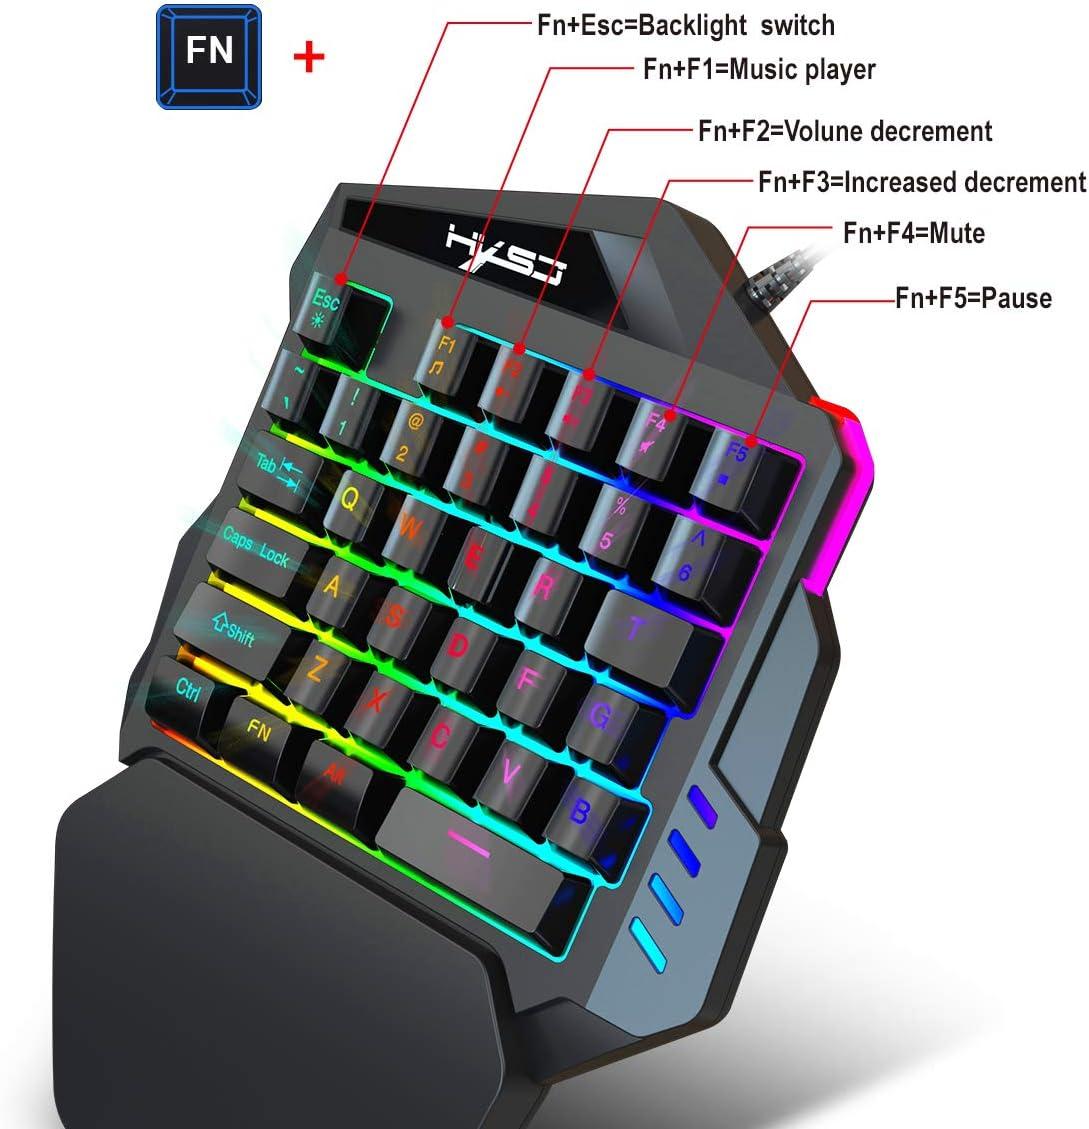 35-Key,Support Wrist Rest One-Handed Keyboard Black Mechanical Gaming Keyboard RGB LED Backlit for PC Computer /& Smartphones